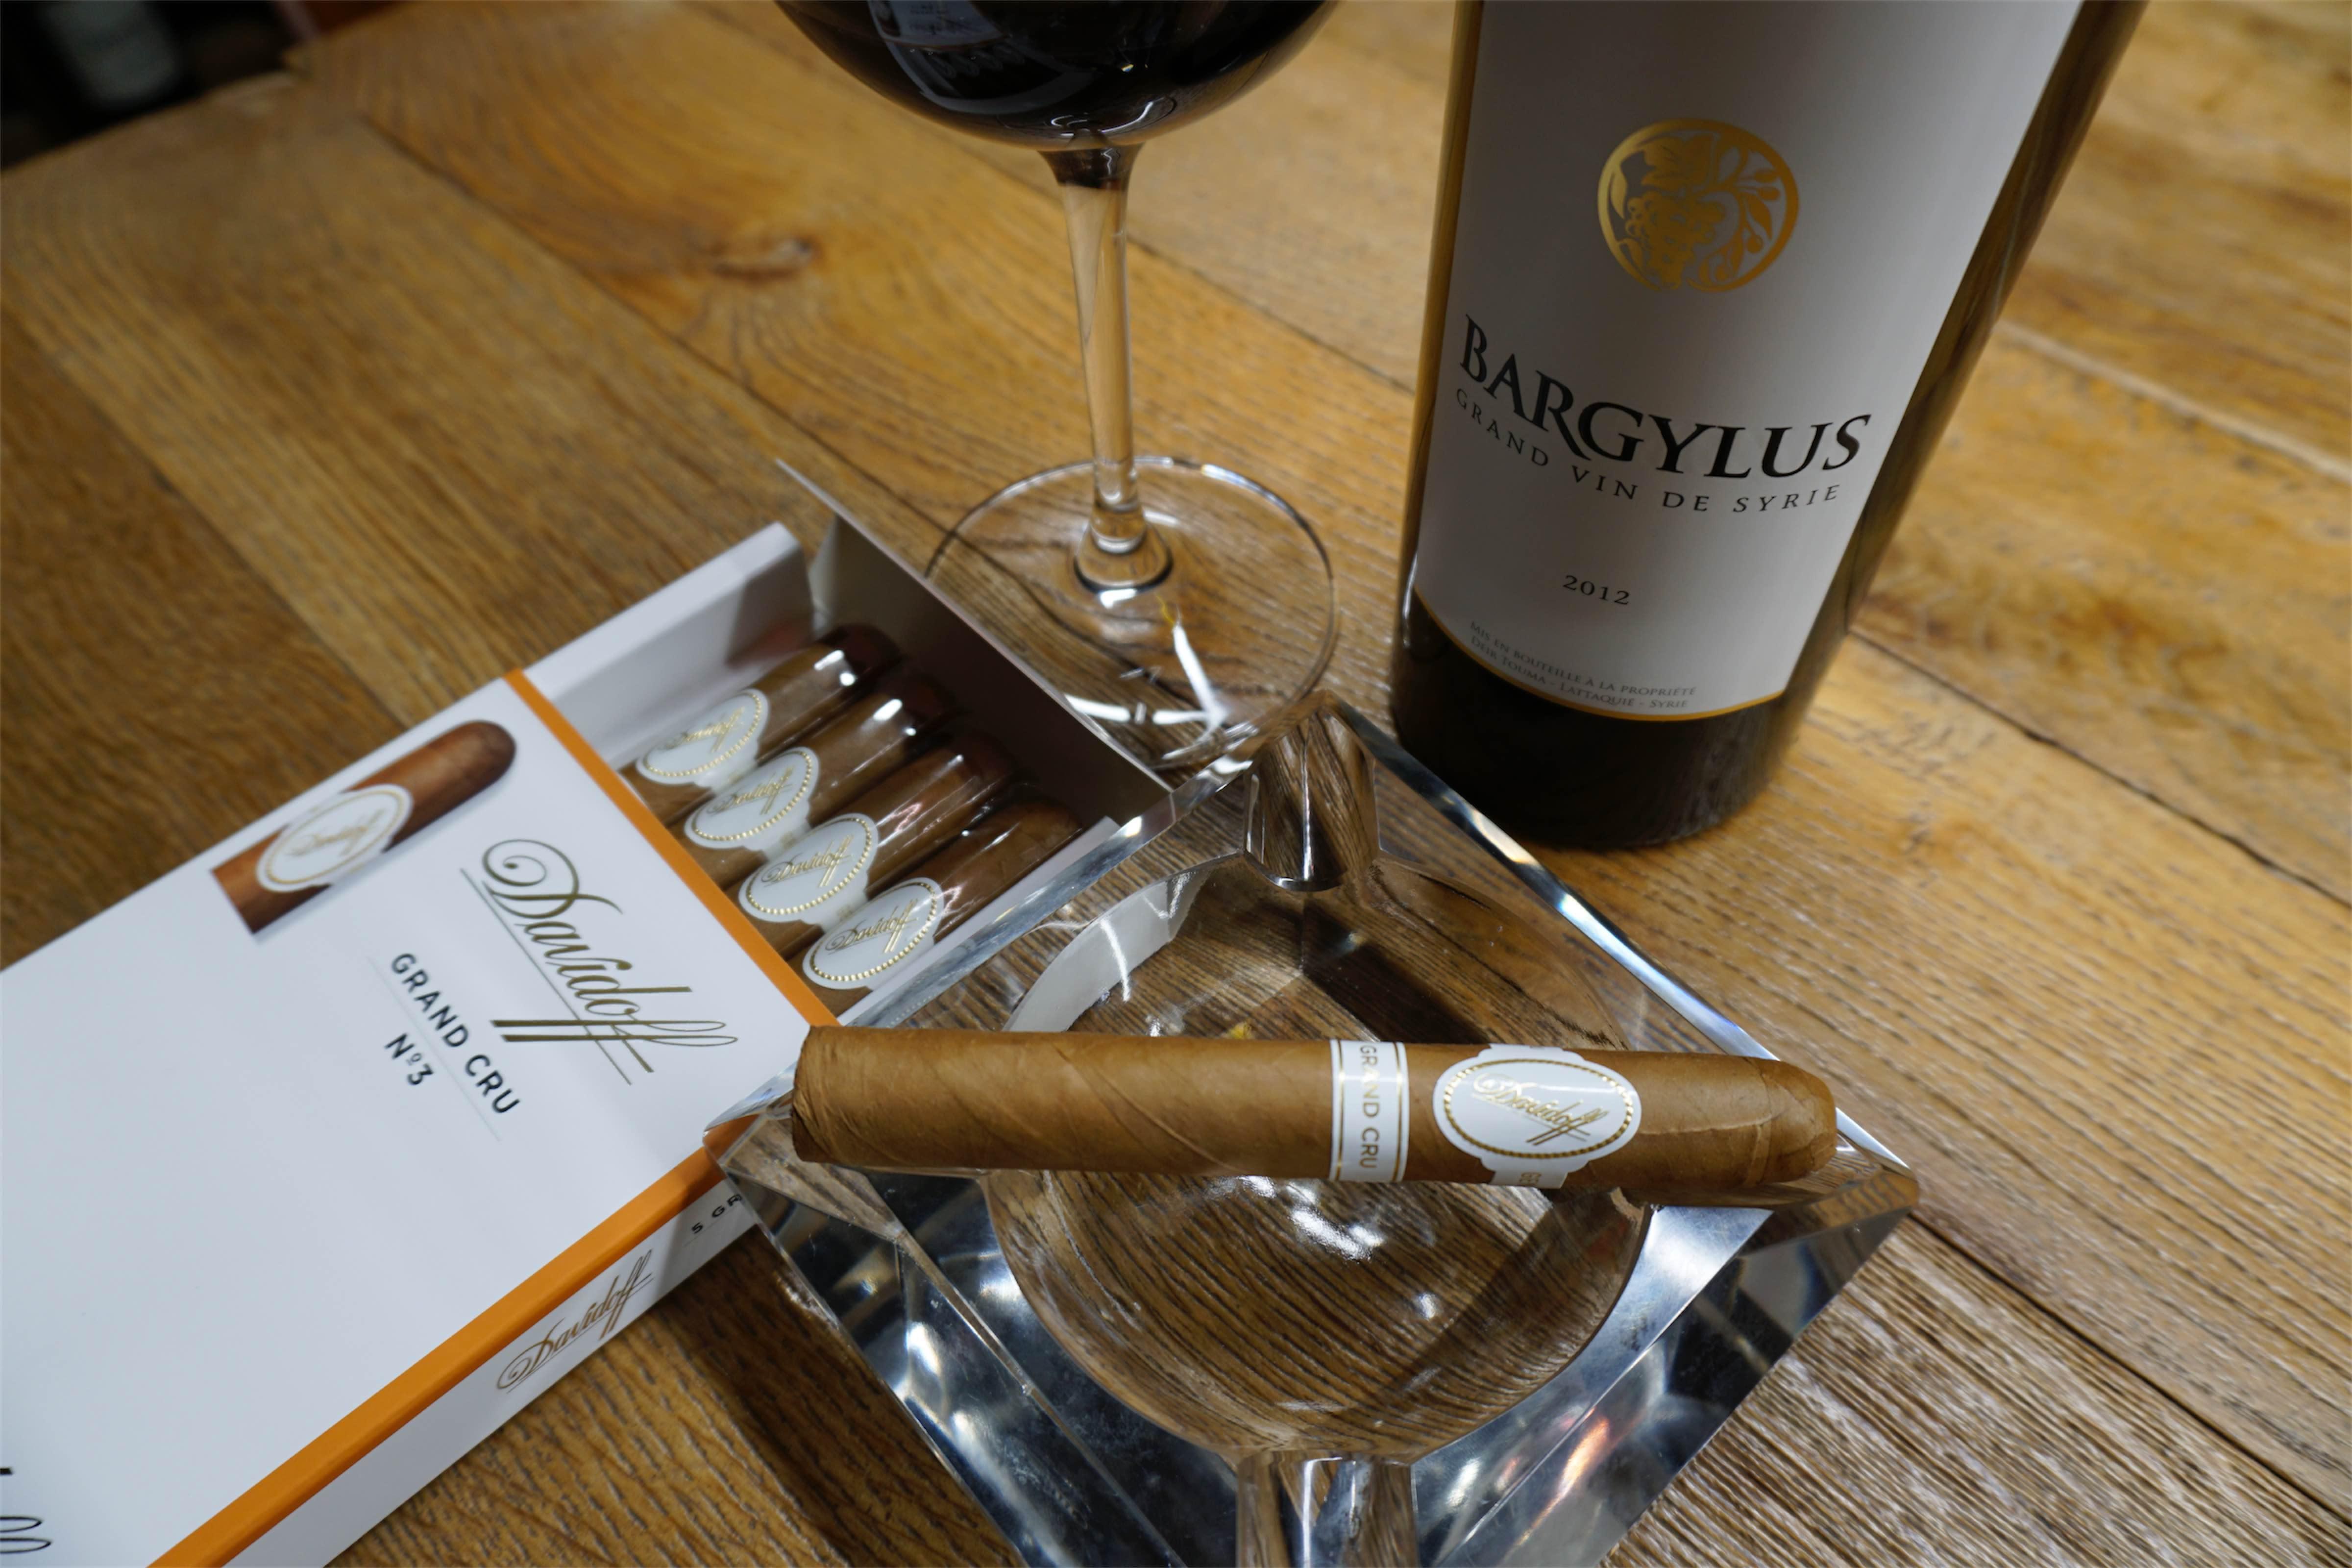 Cygaro i wino - Davidoff Grand Cru i syryjskie wino Bargylus